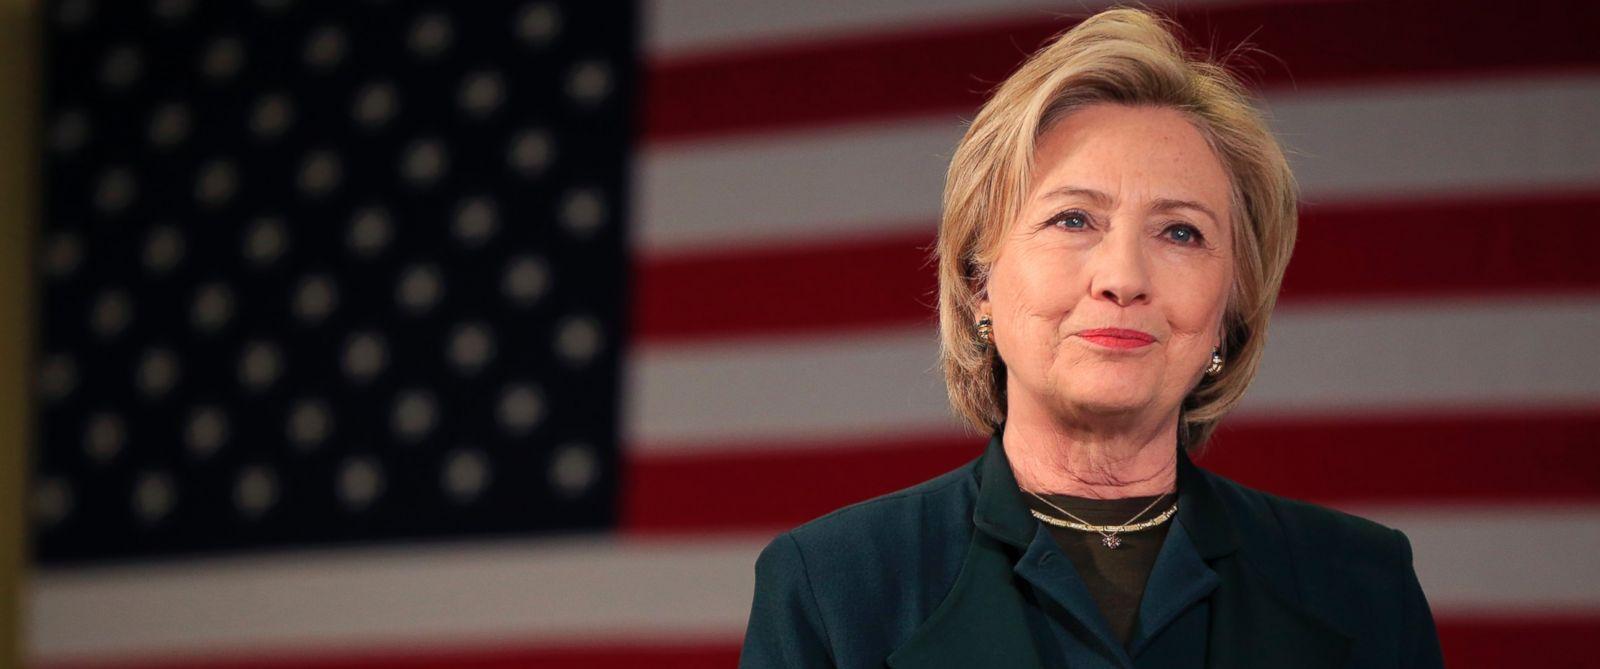 Photo Democratic Presidential Candidate Hillary Rodham